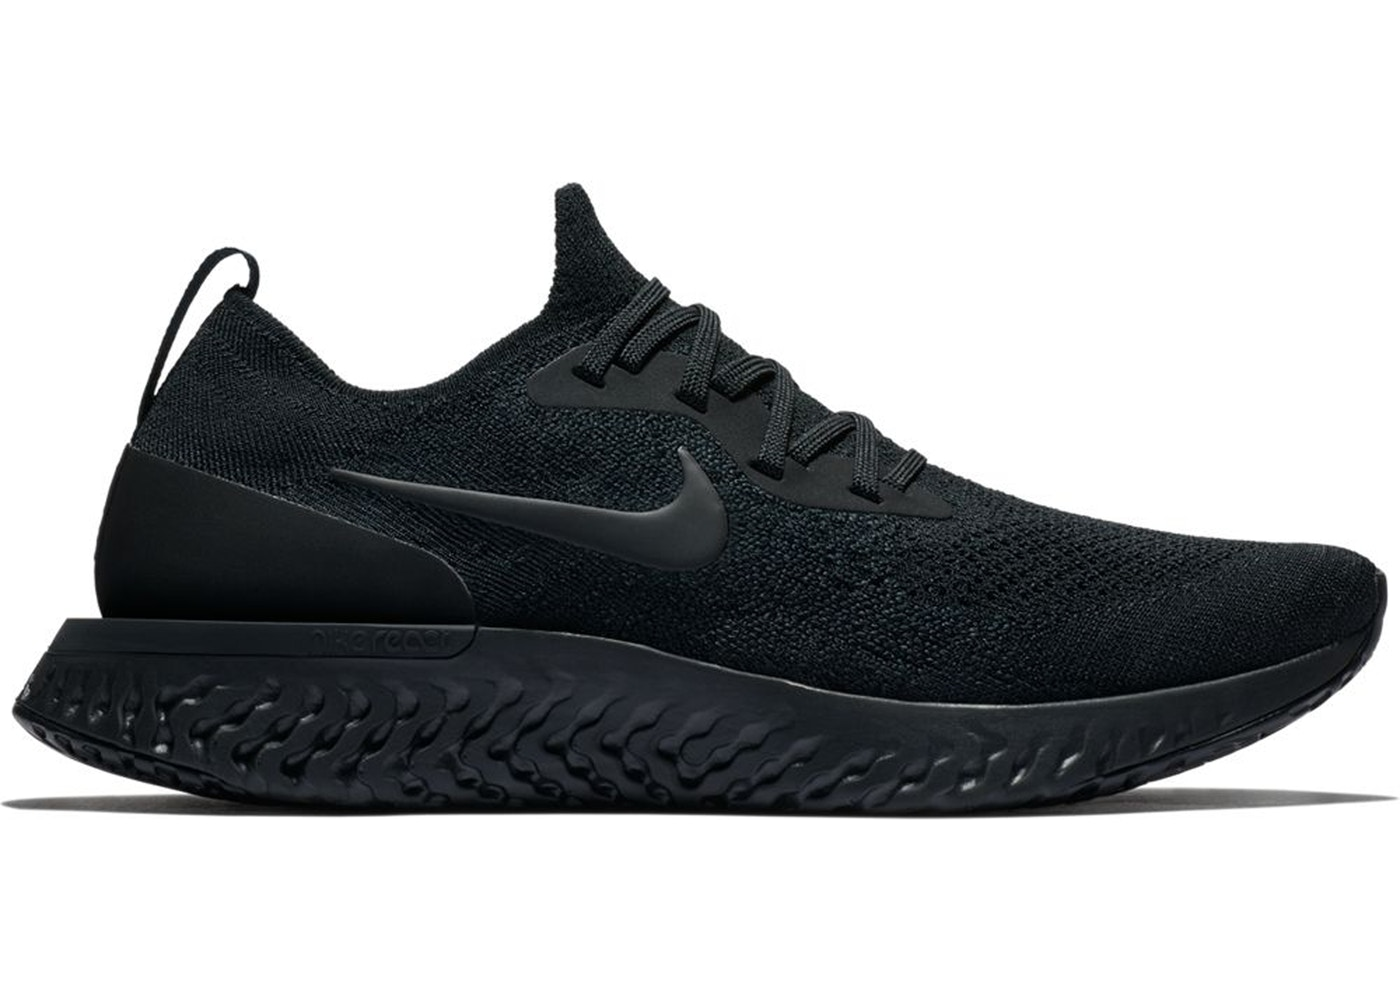 Aq0067 Triple Black Epic Nike React Flyknit 00384046ce80ec9747bcc8f141d18cc3266 Kl1JTFc